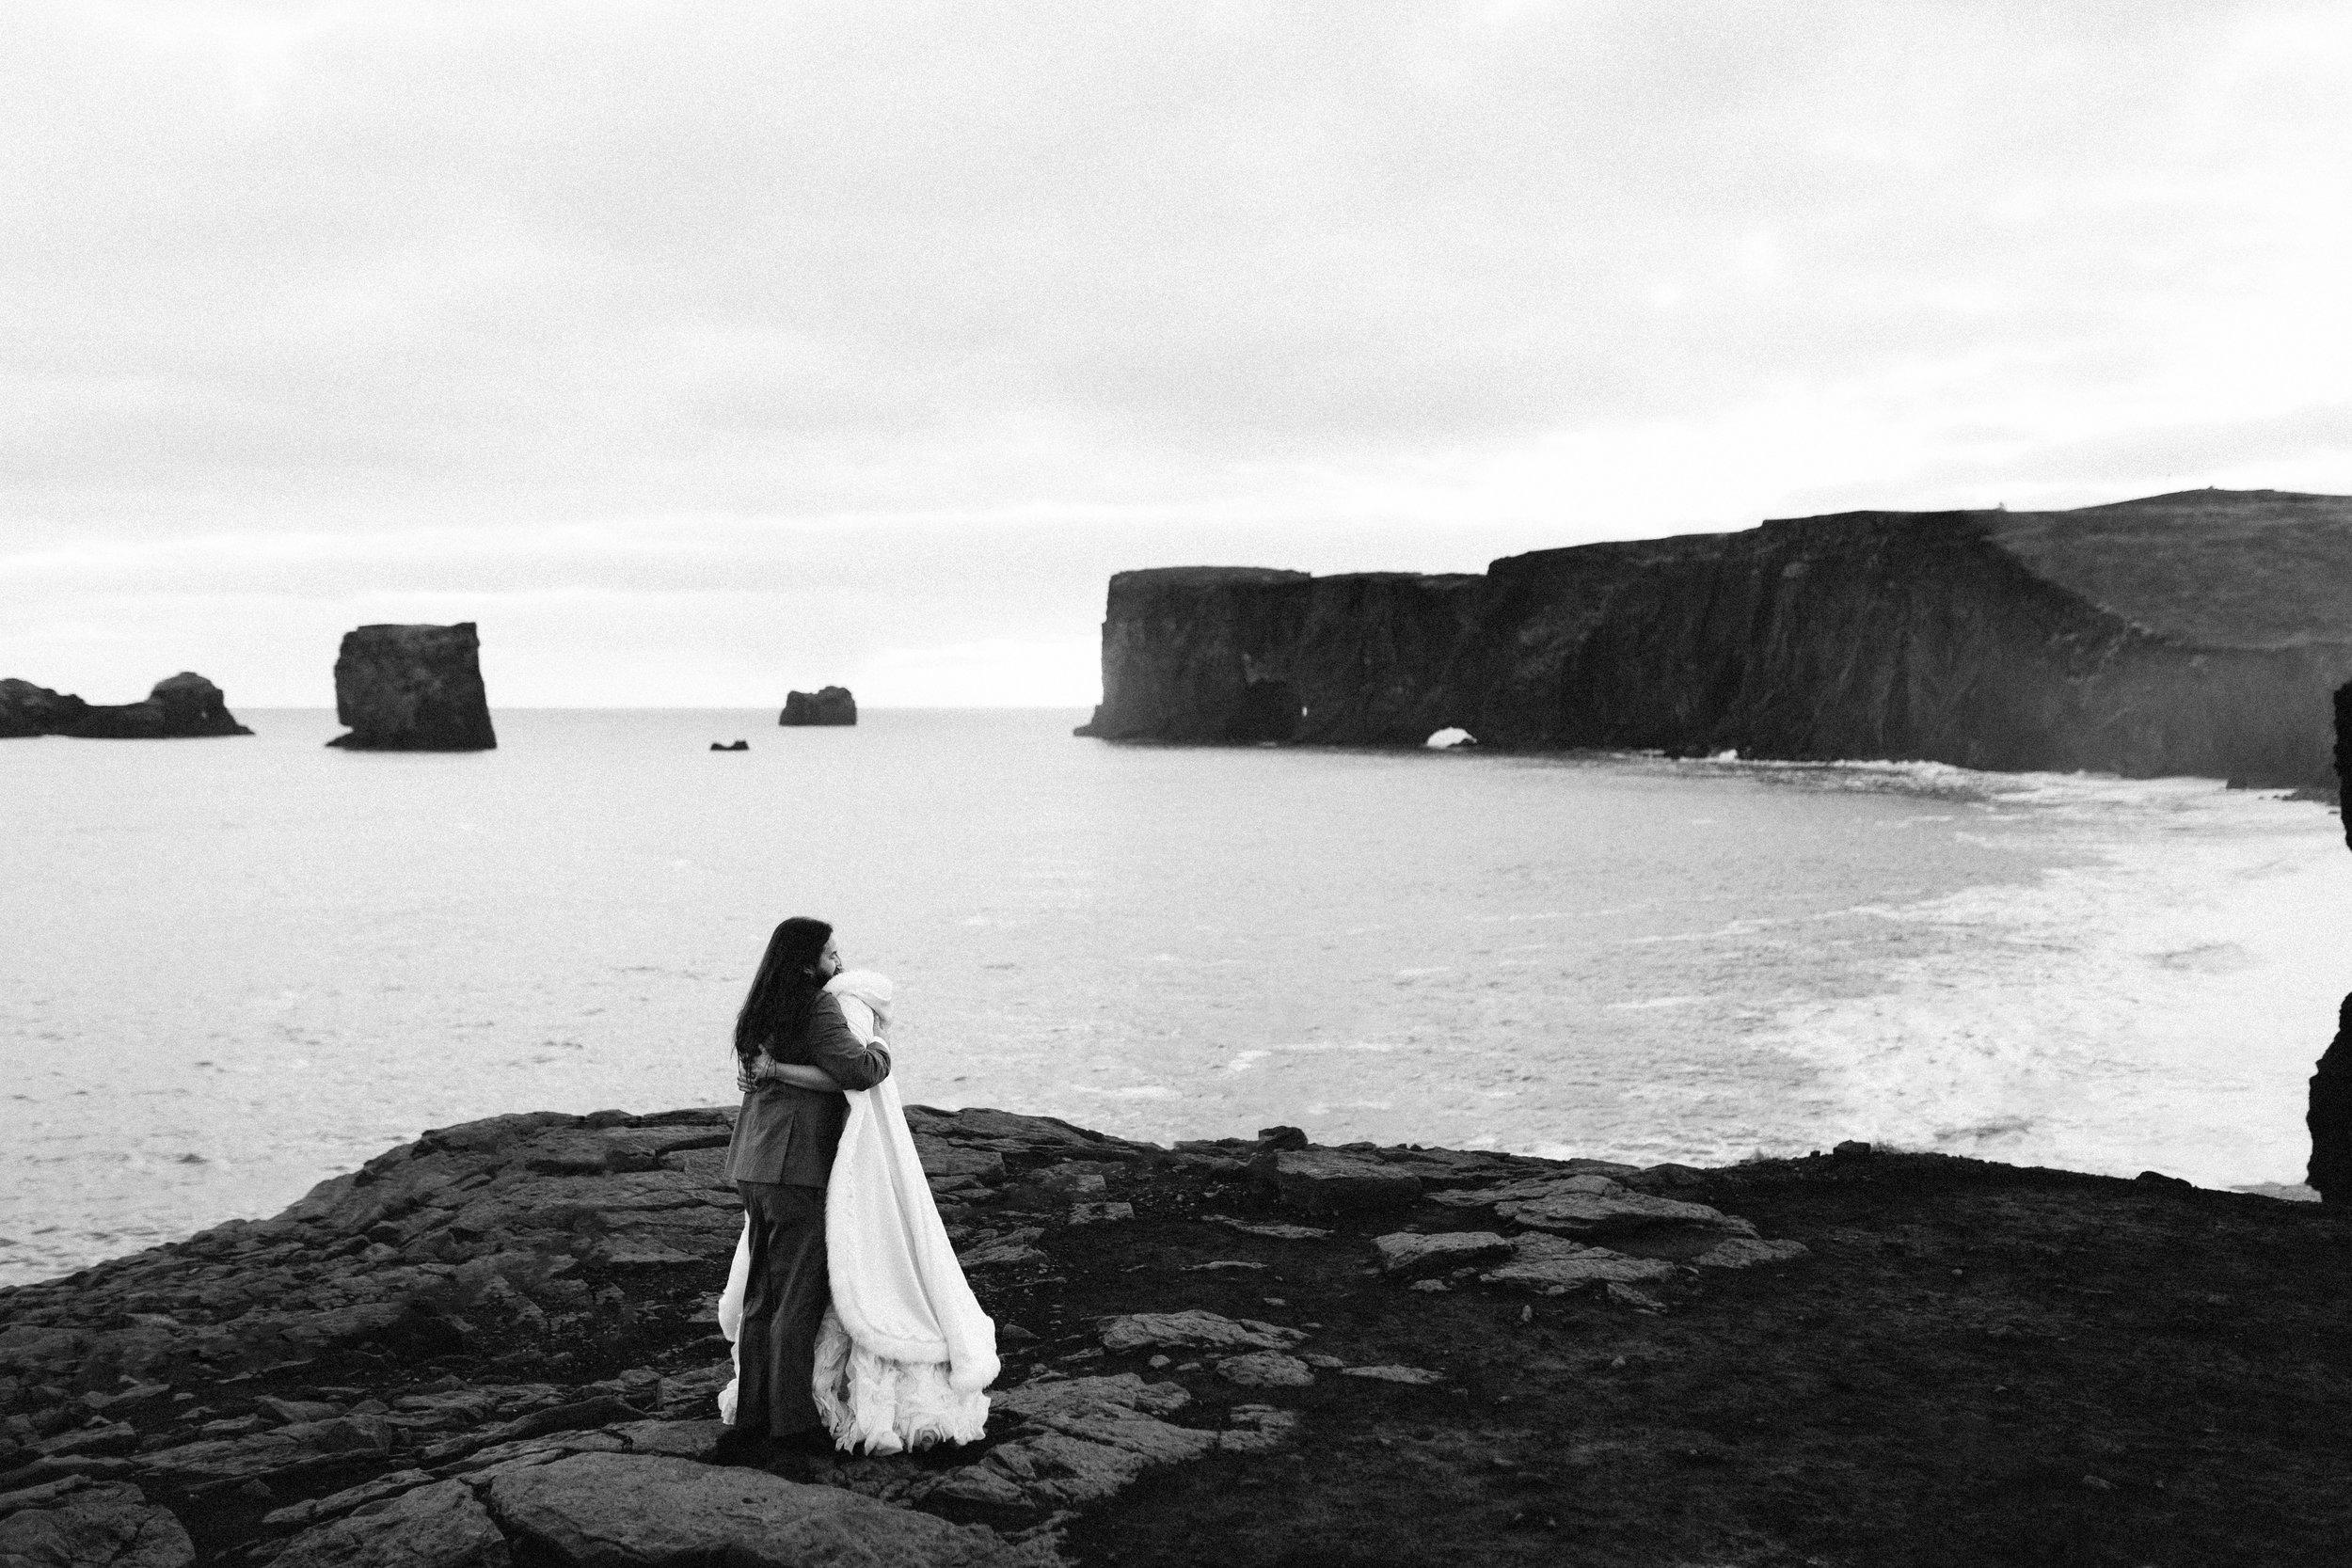 nicole-daacke-photography-iceland-winter-sunset-adventure-elopement-skogafoss-waterfall-black-sand-beach-dyrholaey-vik-iceland-intimate-wedding-black-church-elopement-photographer-56.jpg